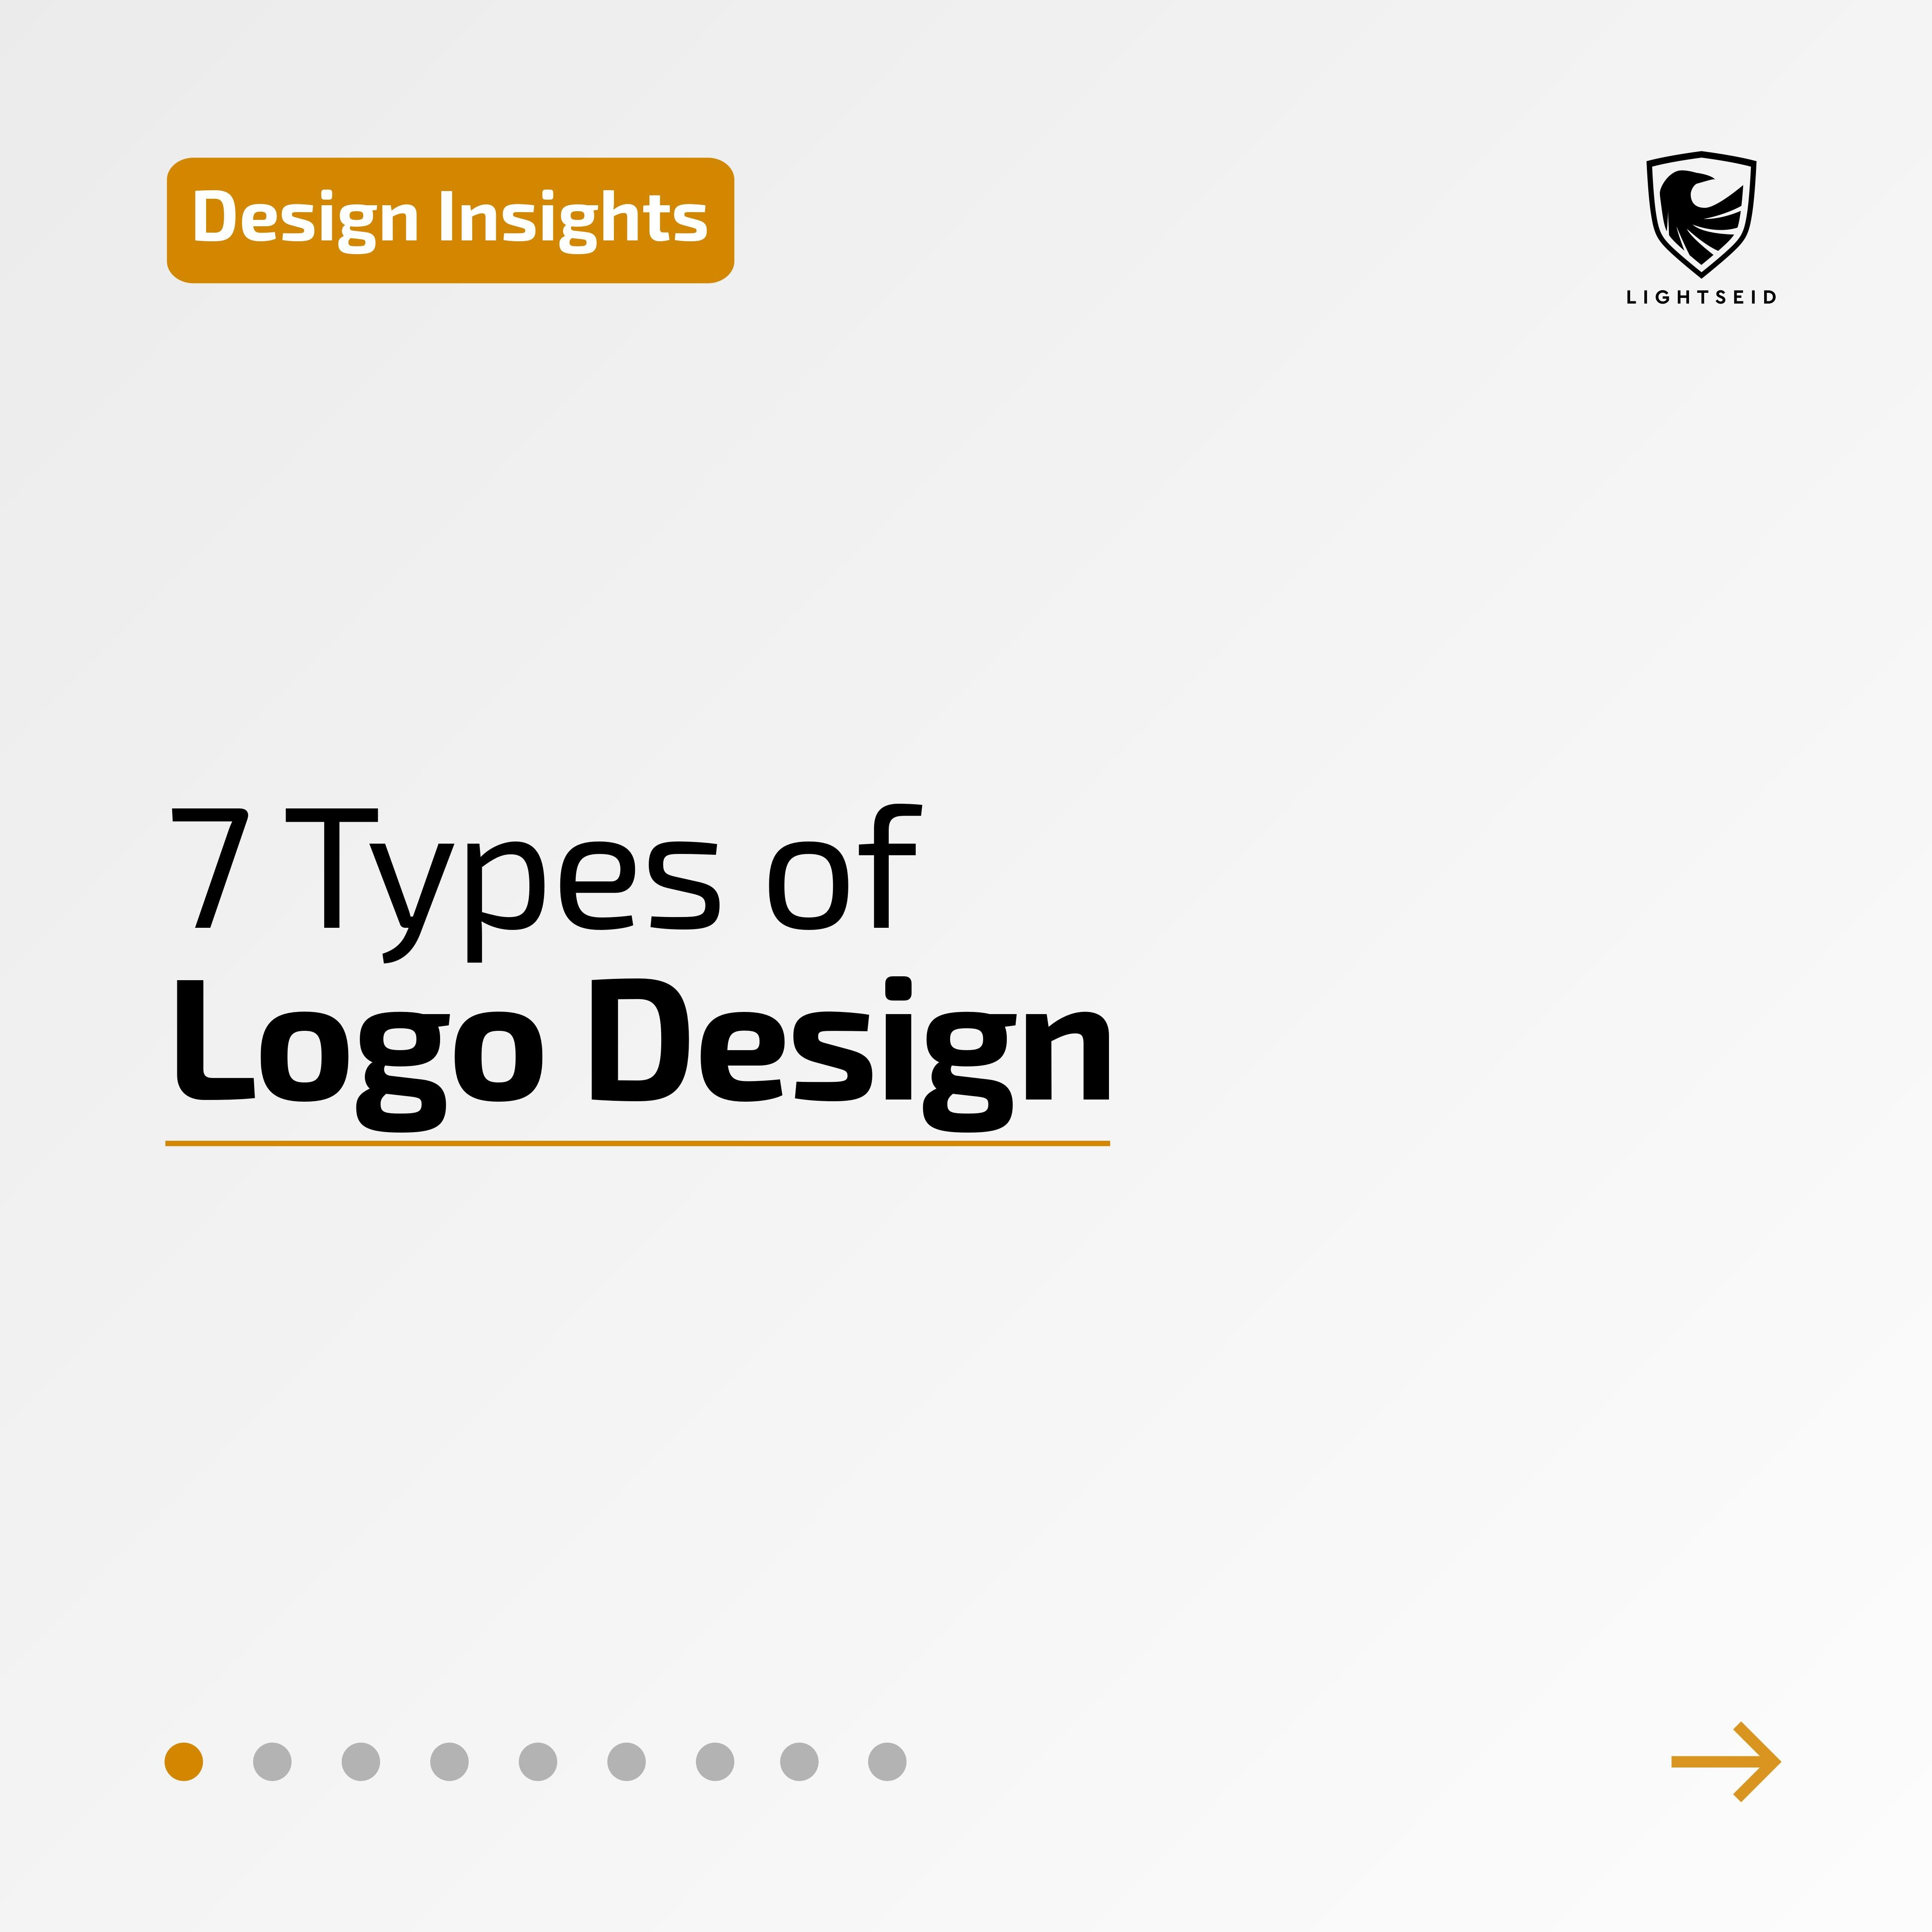 Design Insights